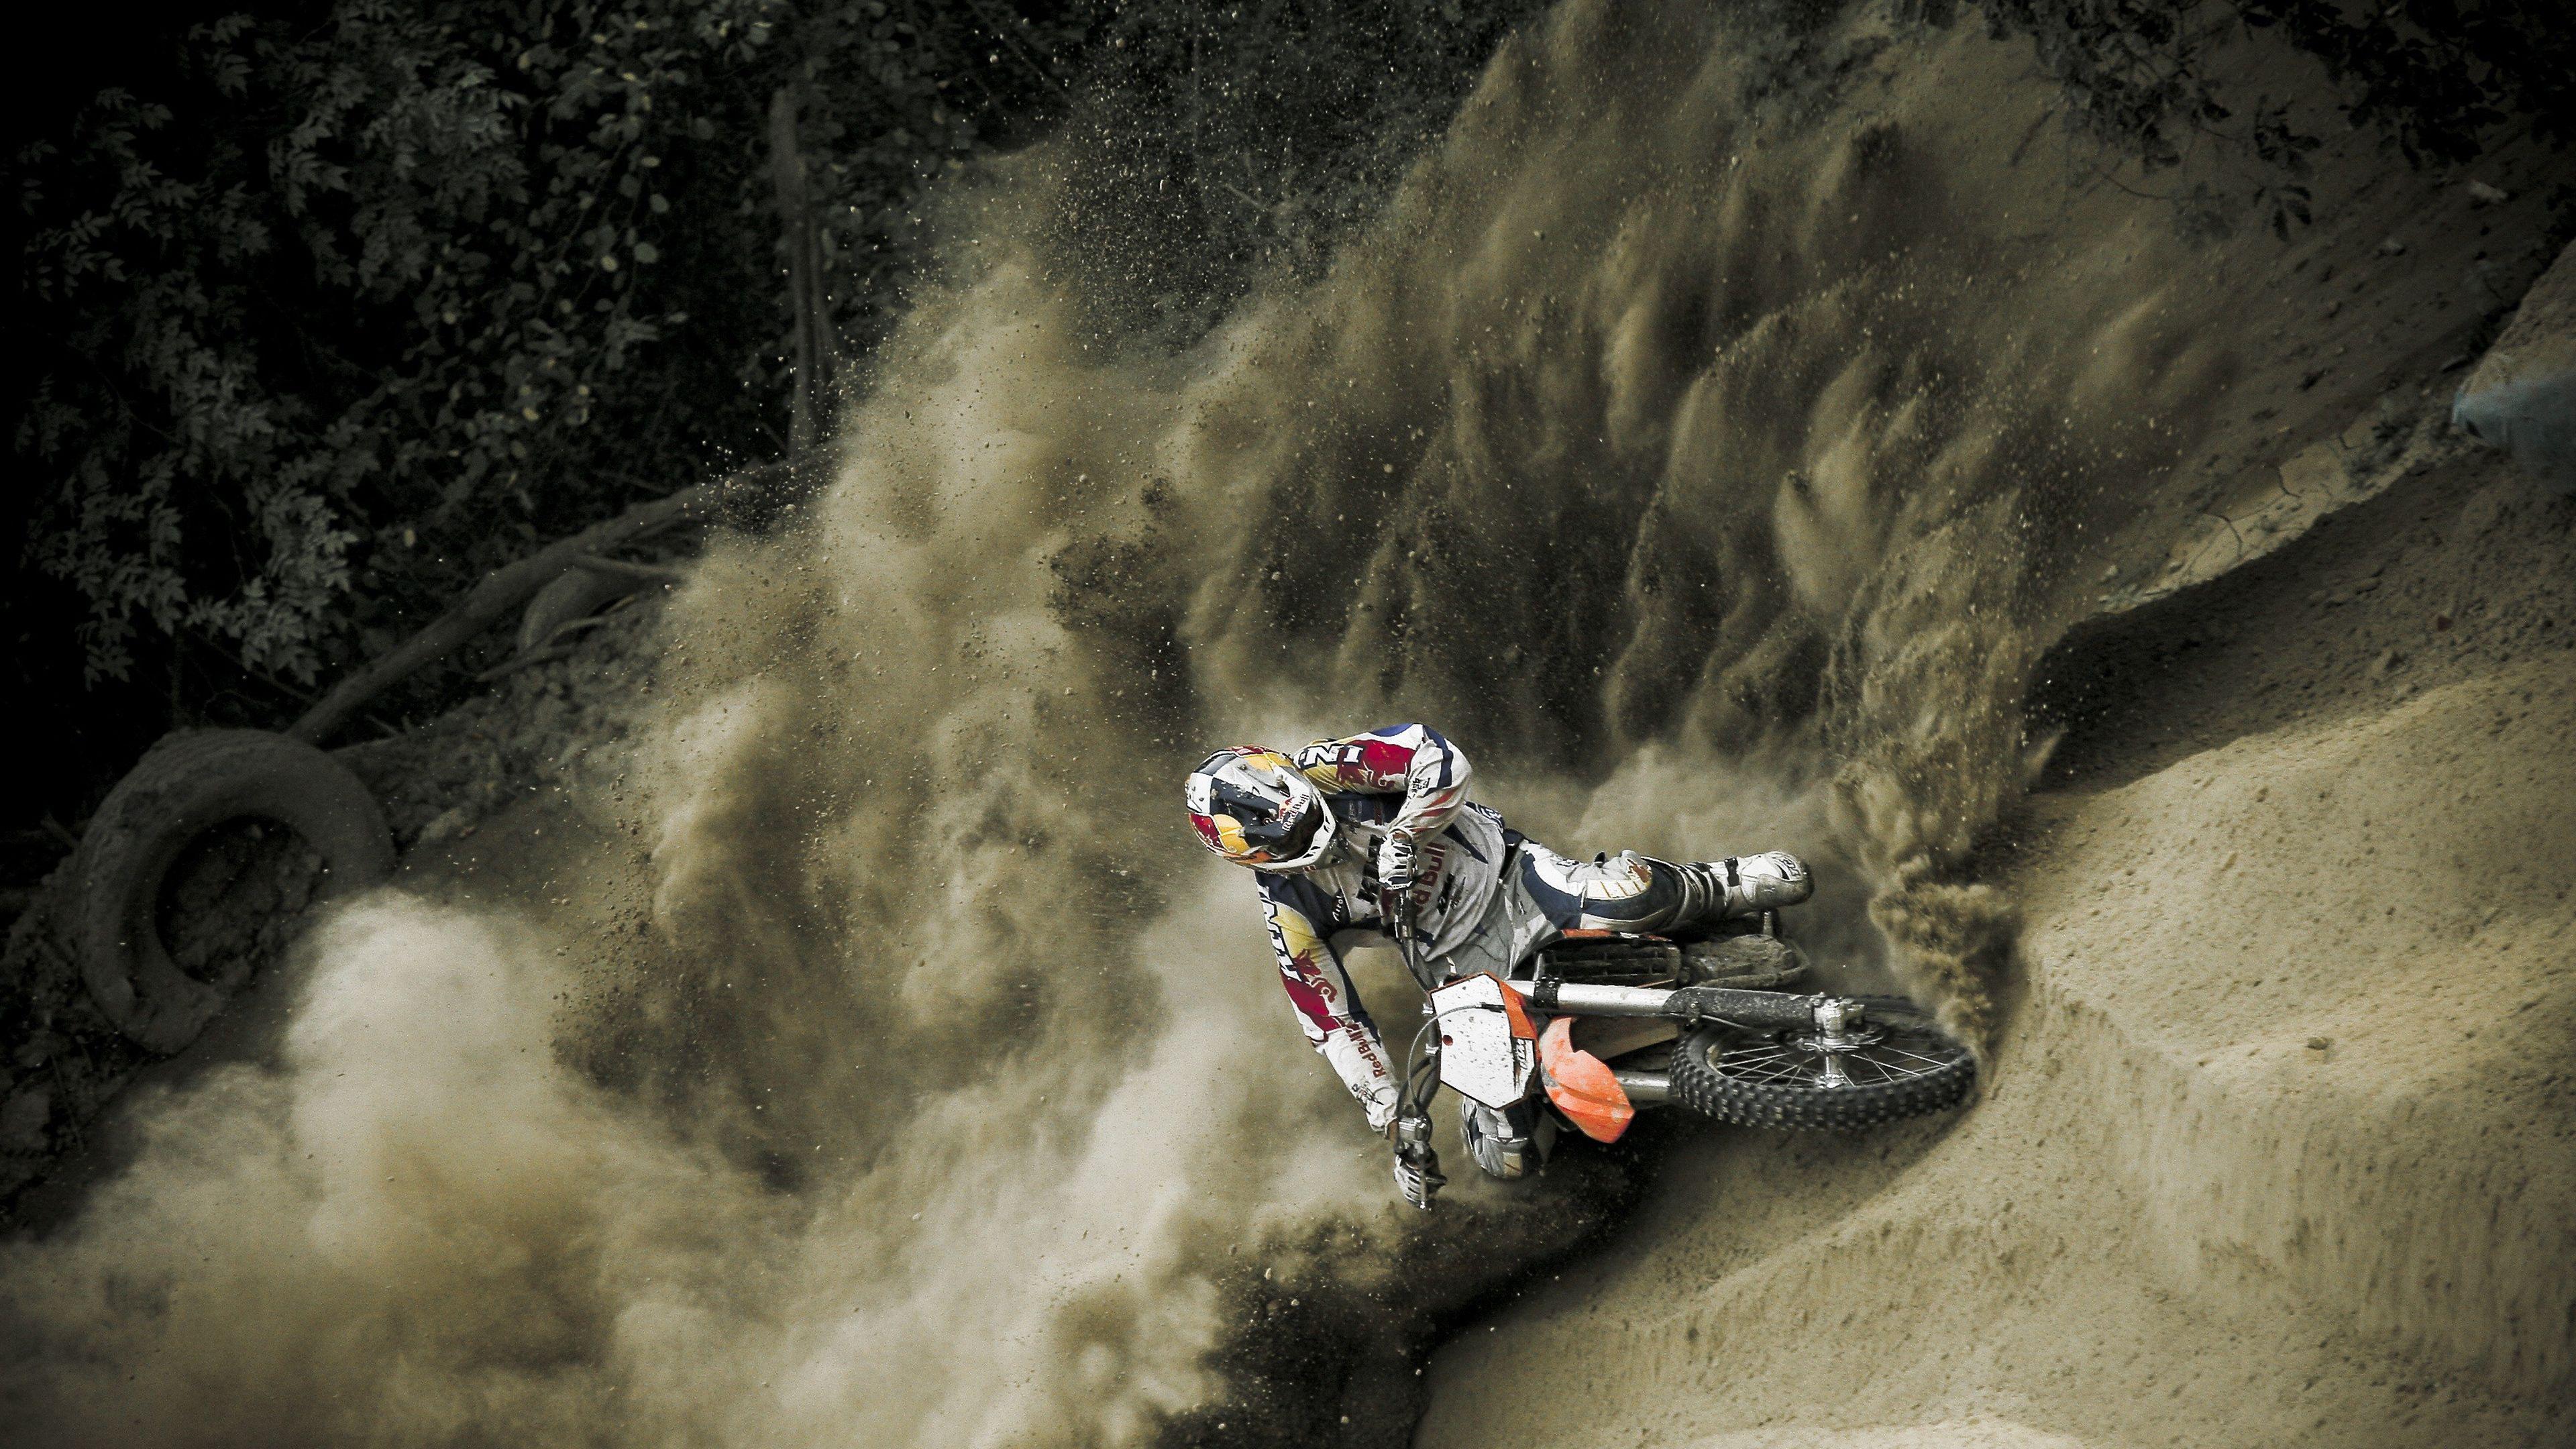 Dirt Bikes Hd Wallpapers: Redbull Dirt Bikes Hd 4K Wallpaper